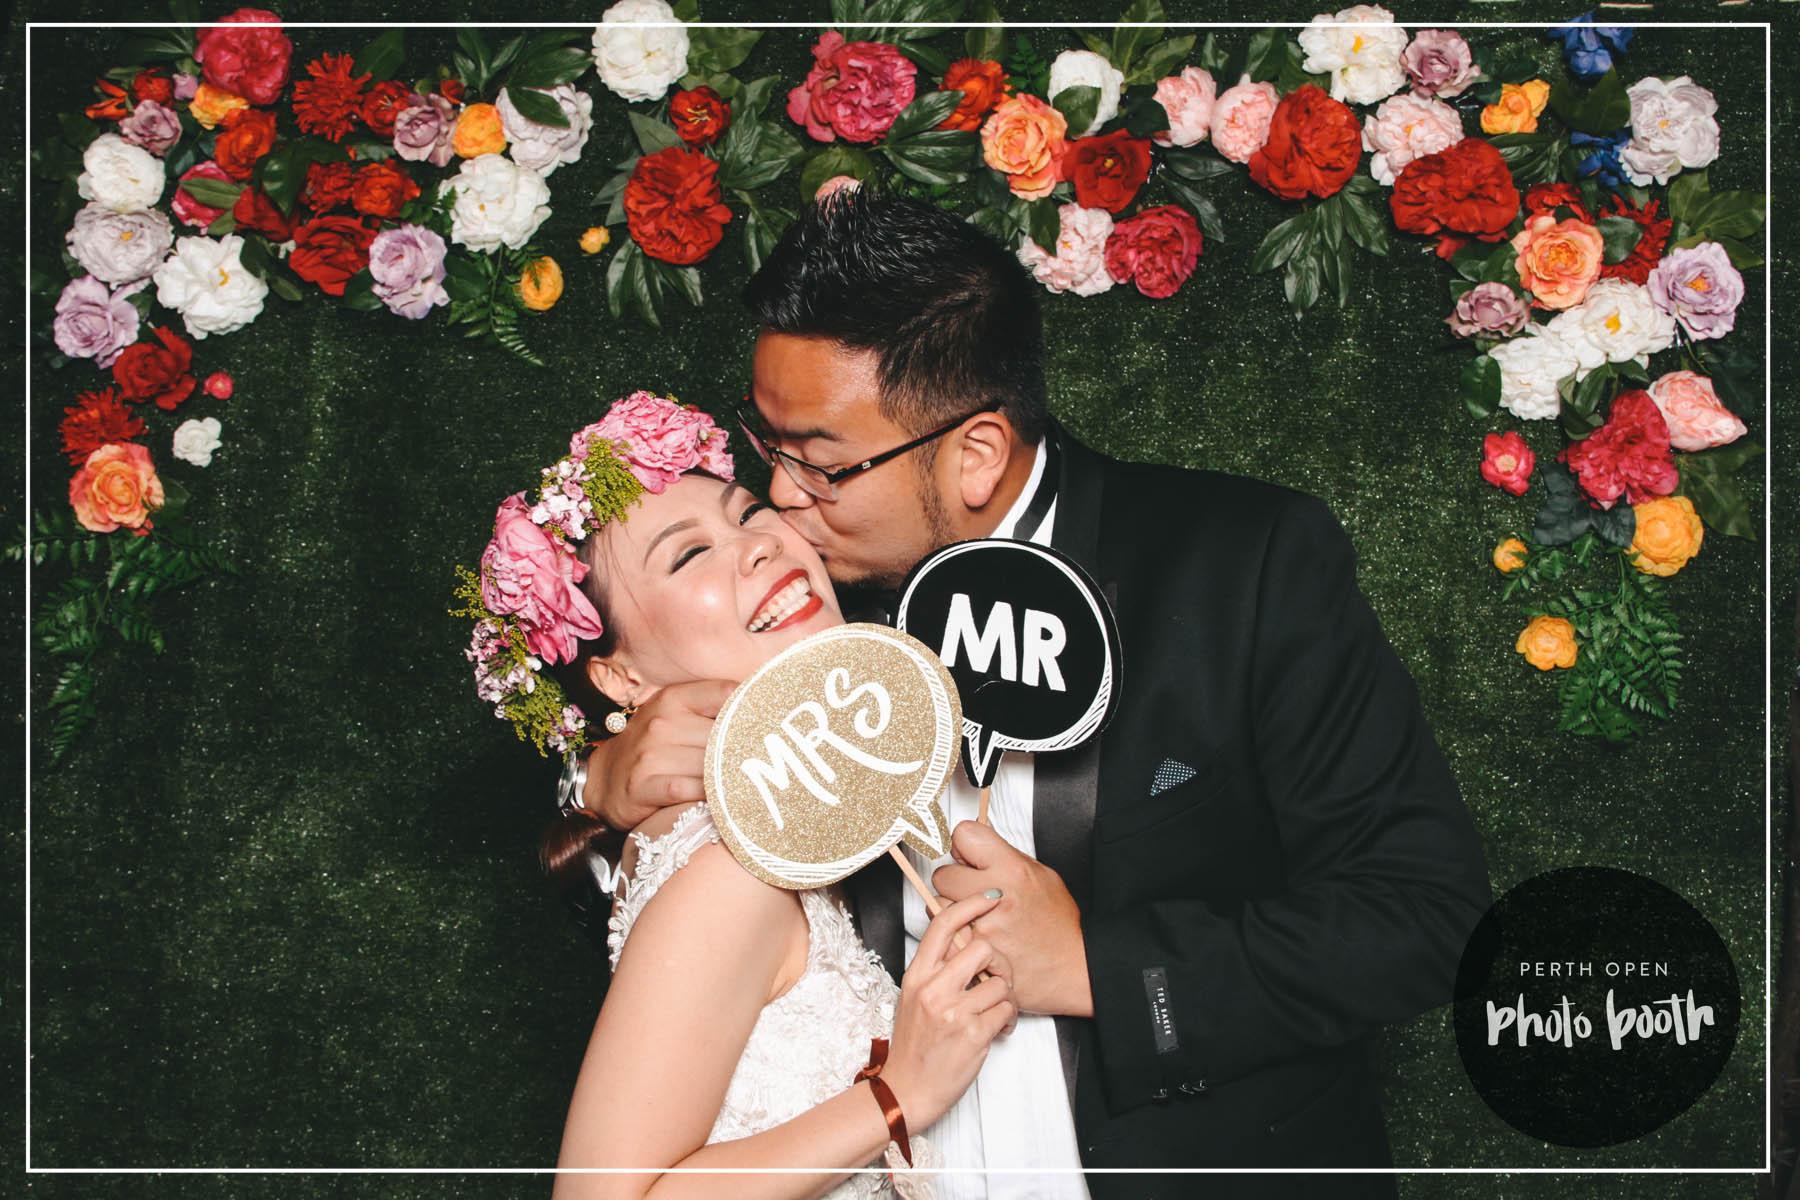 Elvi & Leonard  's Wedding Reception   Password: Provided on the night   - all lowercase -